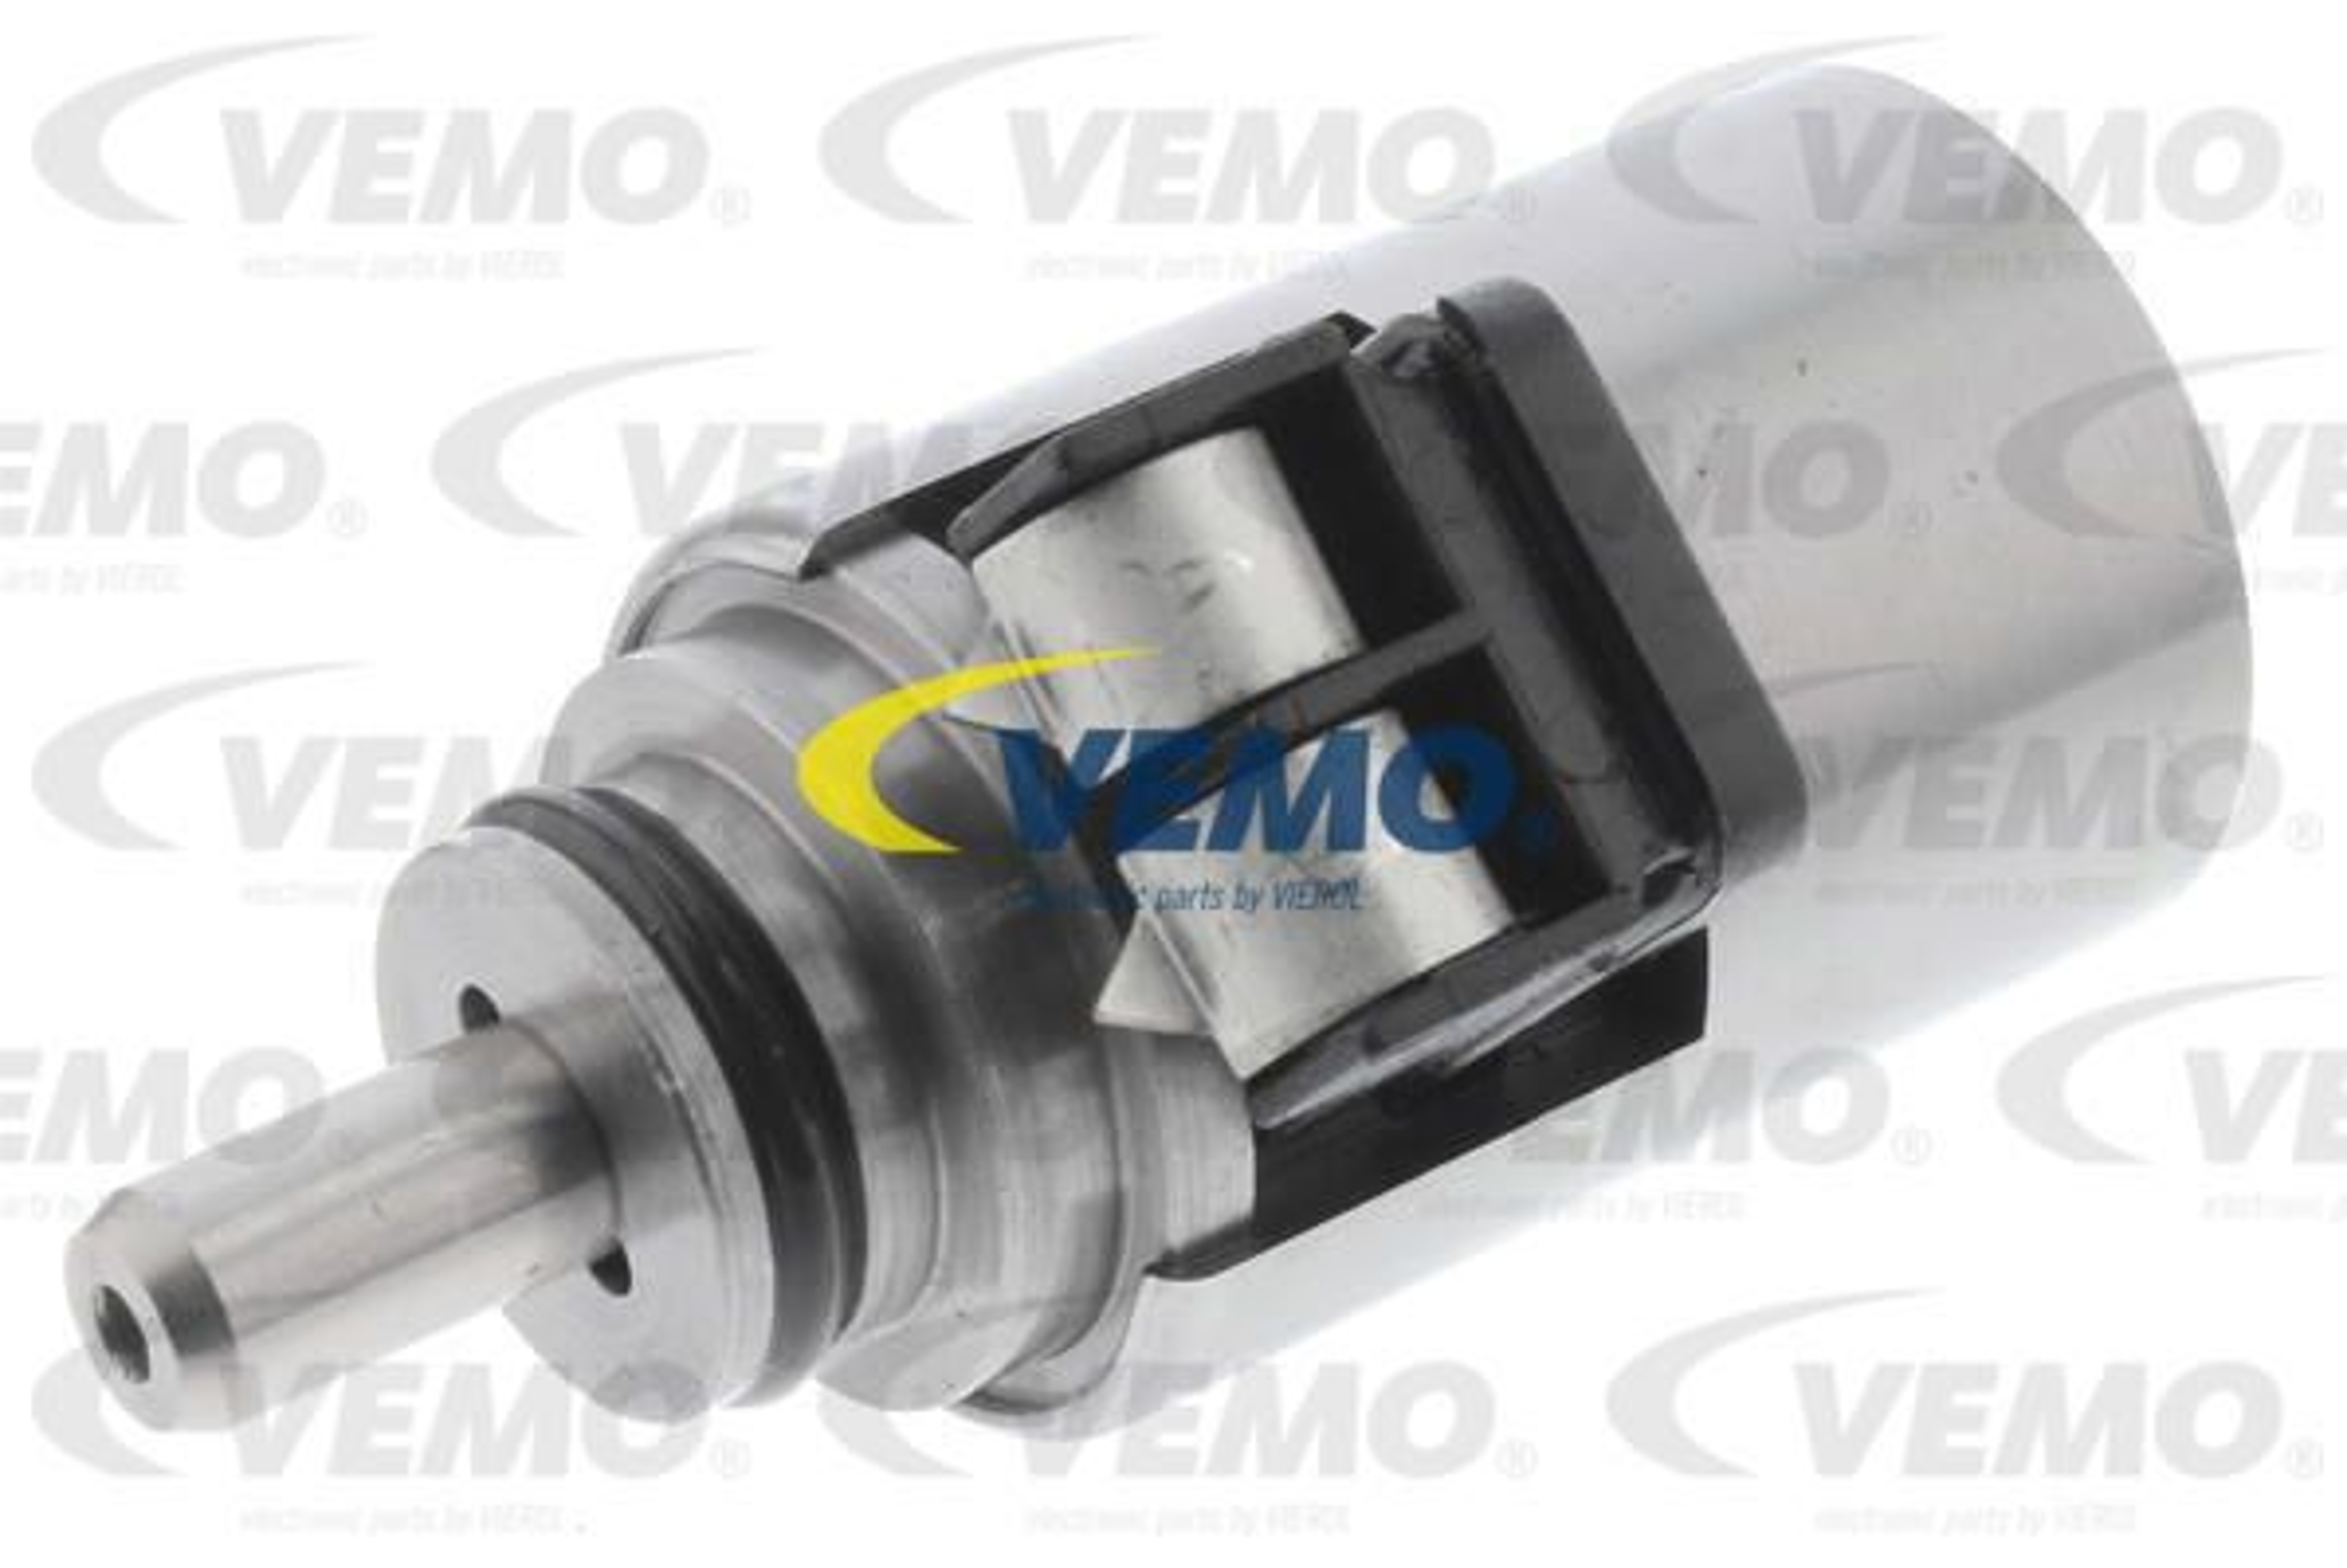 MERCEDES-BENZ E-Klasse 2016 Schaltventil, Automatikgetriebe - Original VEMO V30-77-1013